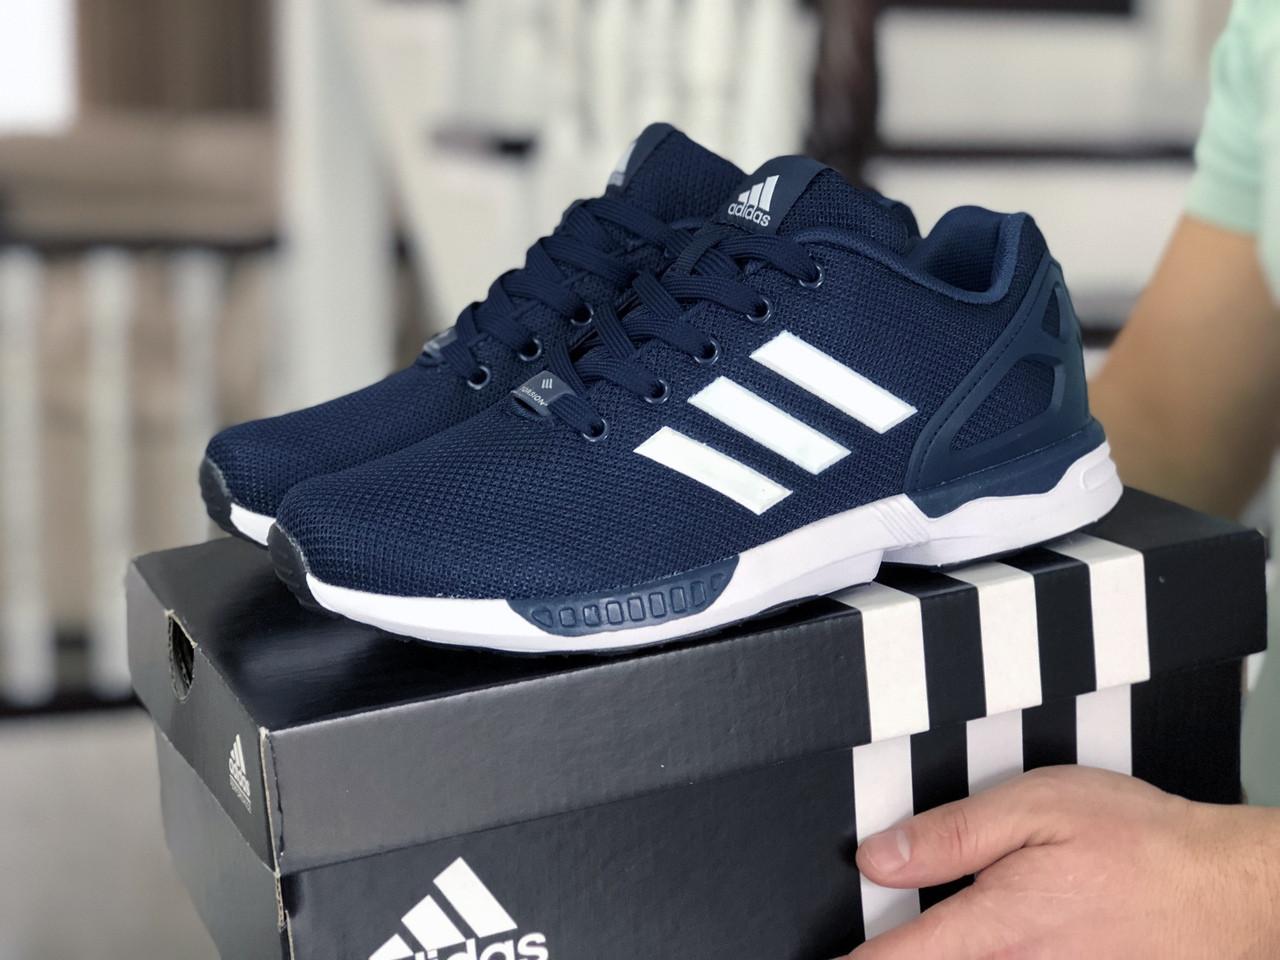 Мужские кроссовки Adidas Zx Flux (темно-синие с белым) 9060